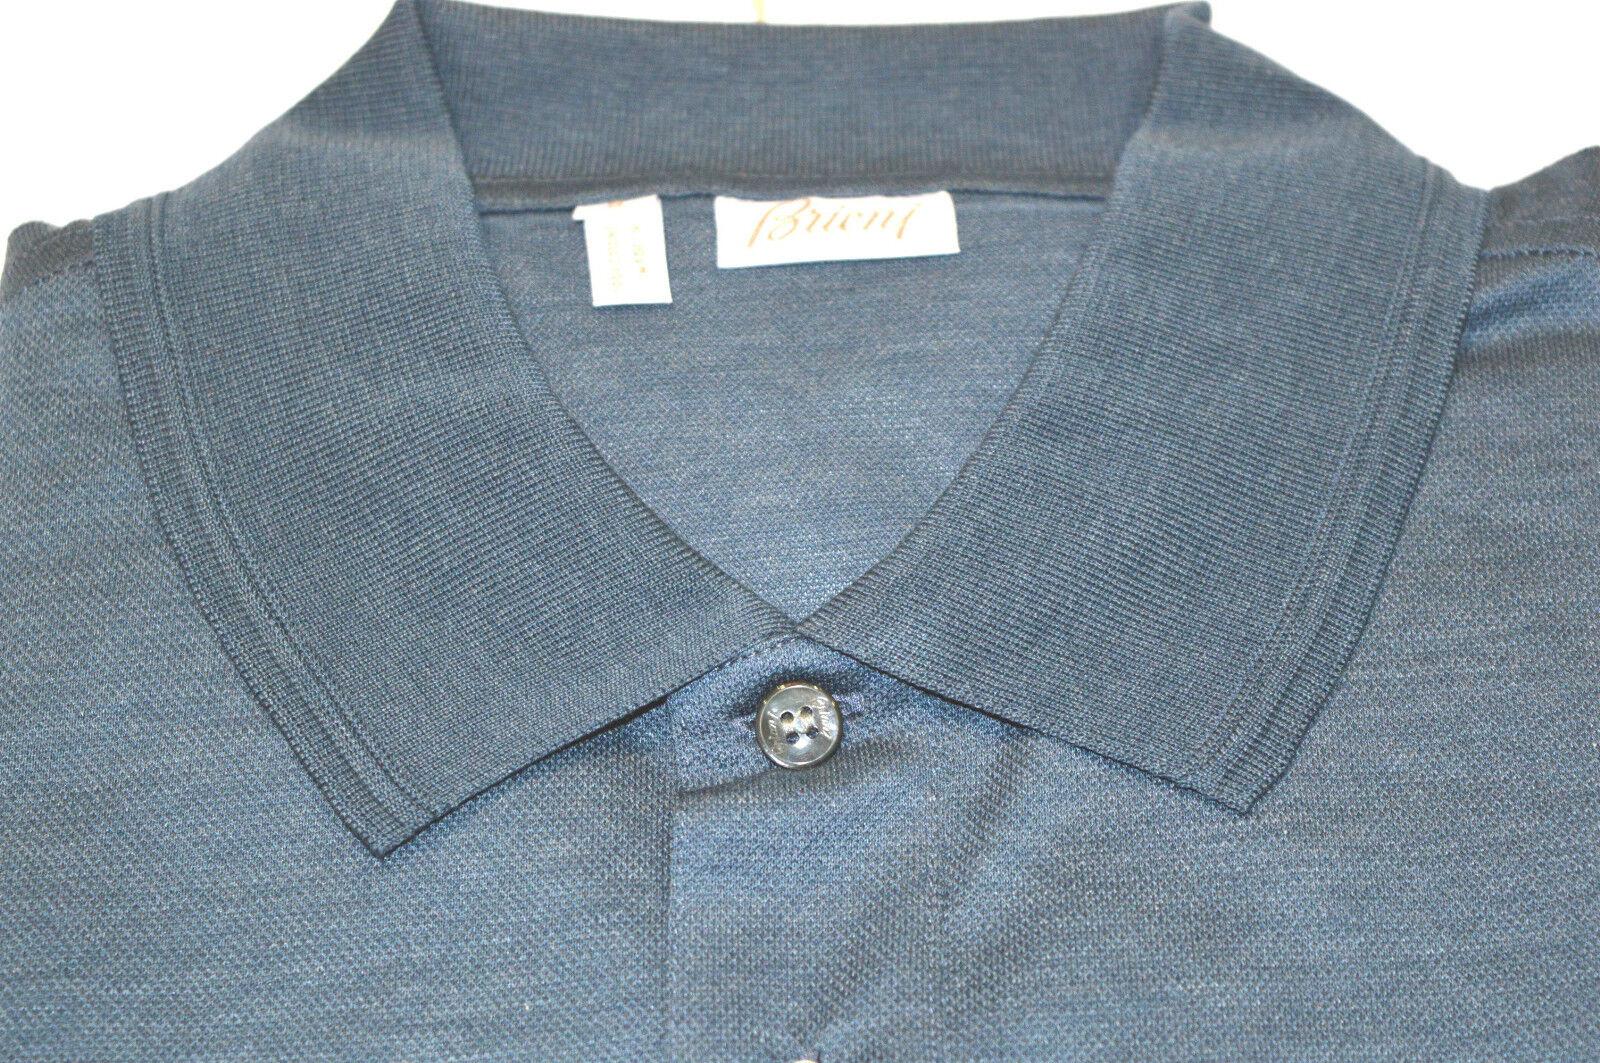 NEW  BRIONI Polo Polo Polo  Short Sleeve Cotton Size S Us Eu 48 (SpStampA) 5095d5